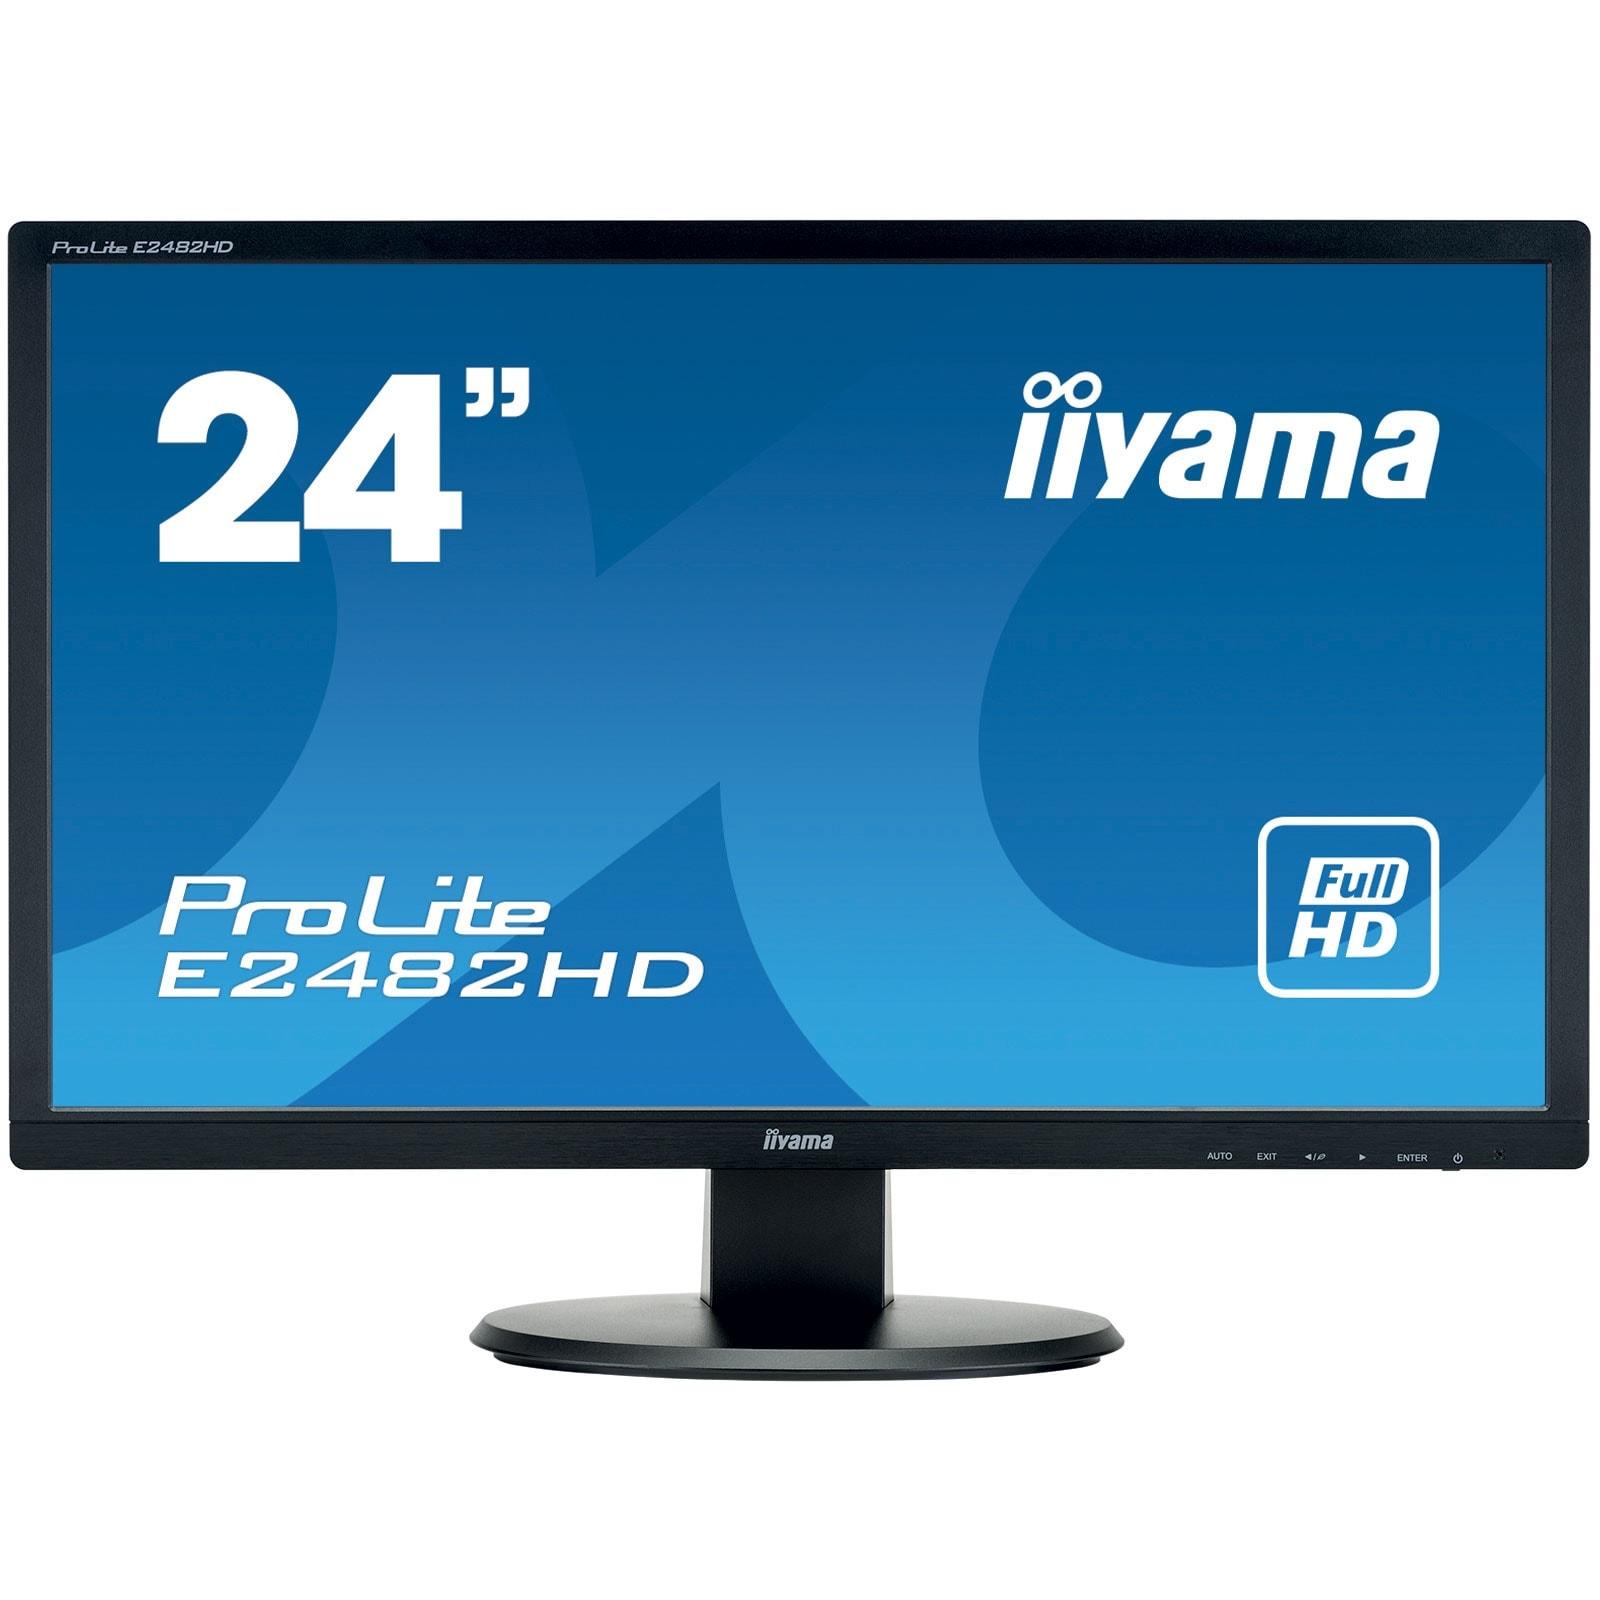 Iiyama E2482HD-B1 (E2482HD-B1) - Achat / Vente Ecran PC sur Cybertek.fr - 0